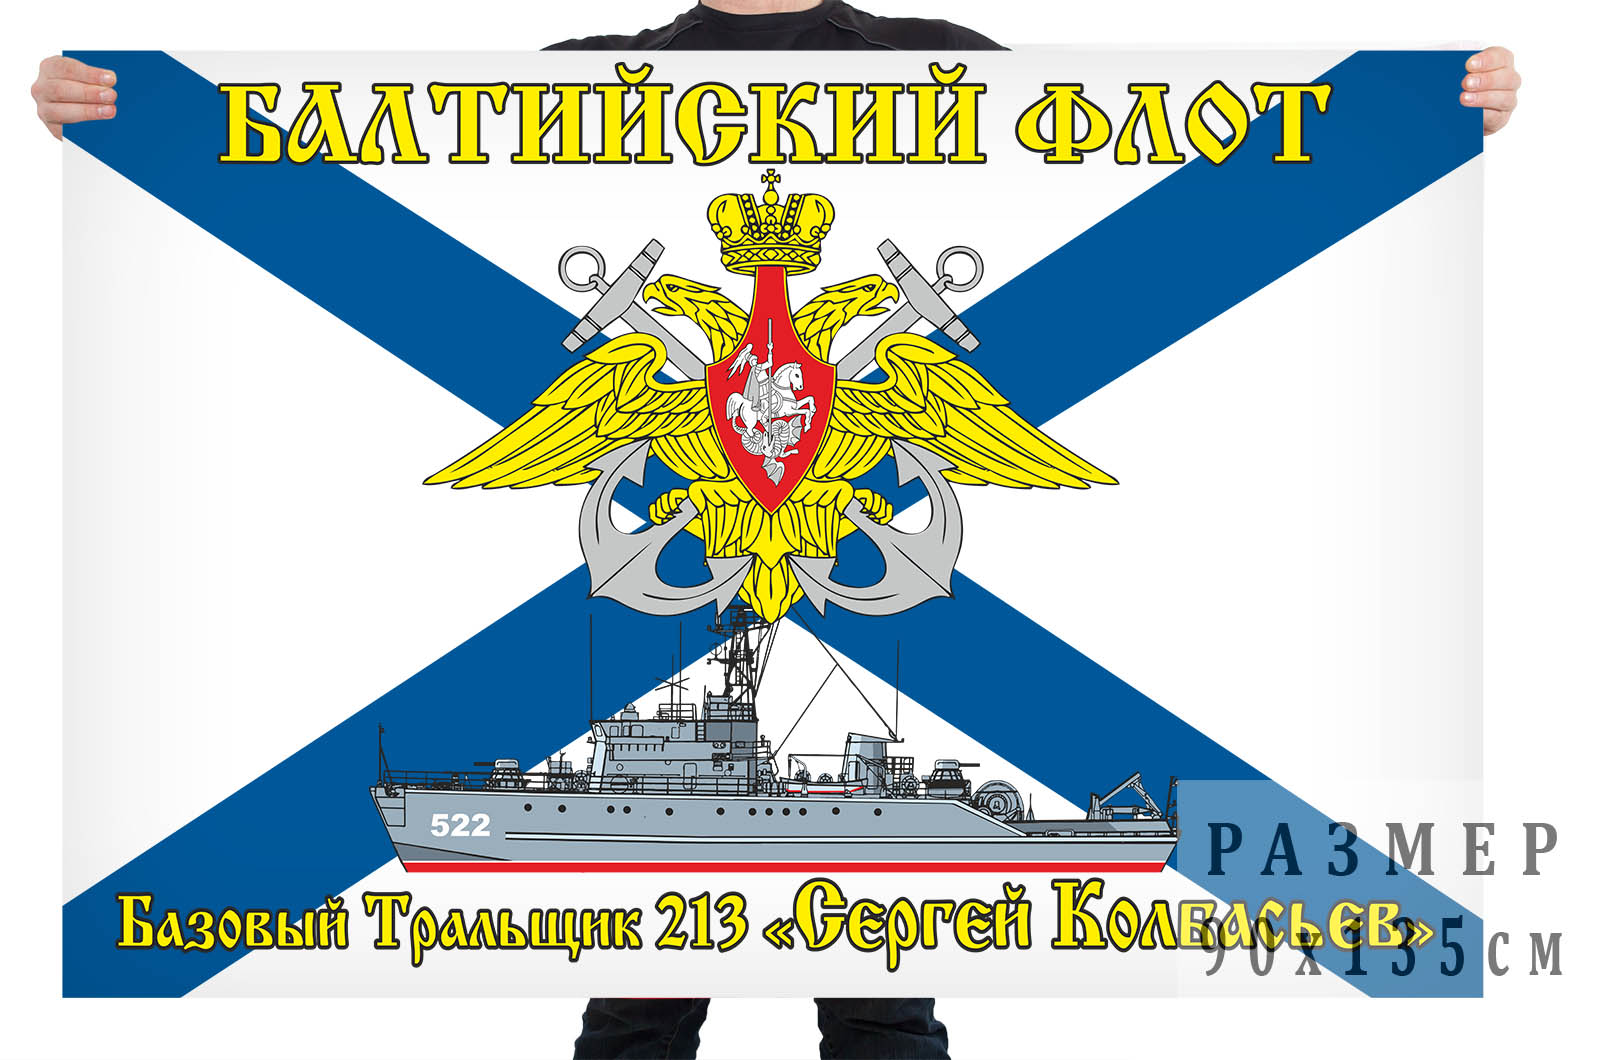 Флаг базового тральщика 213 Сергей Колбасьев